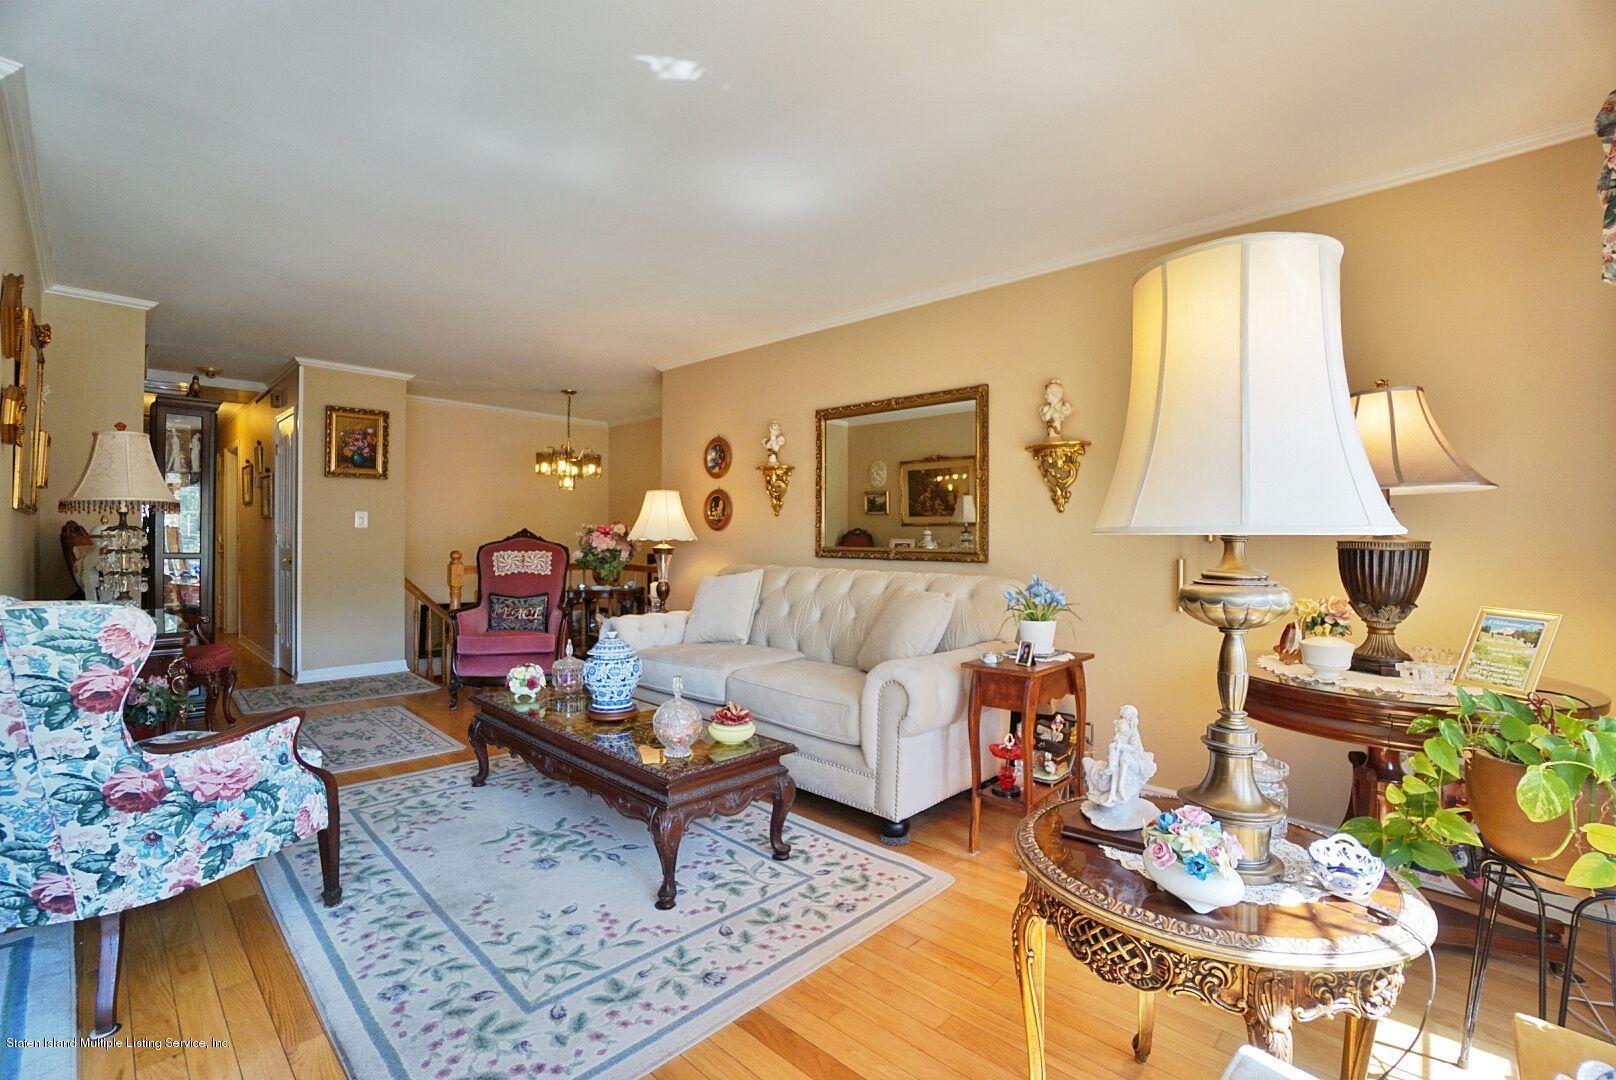 Single Family - Detached 283 Holdridge Avenue  Staten Island, NY 10312, MLS-1130000-7